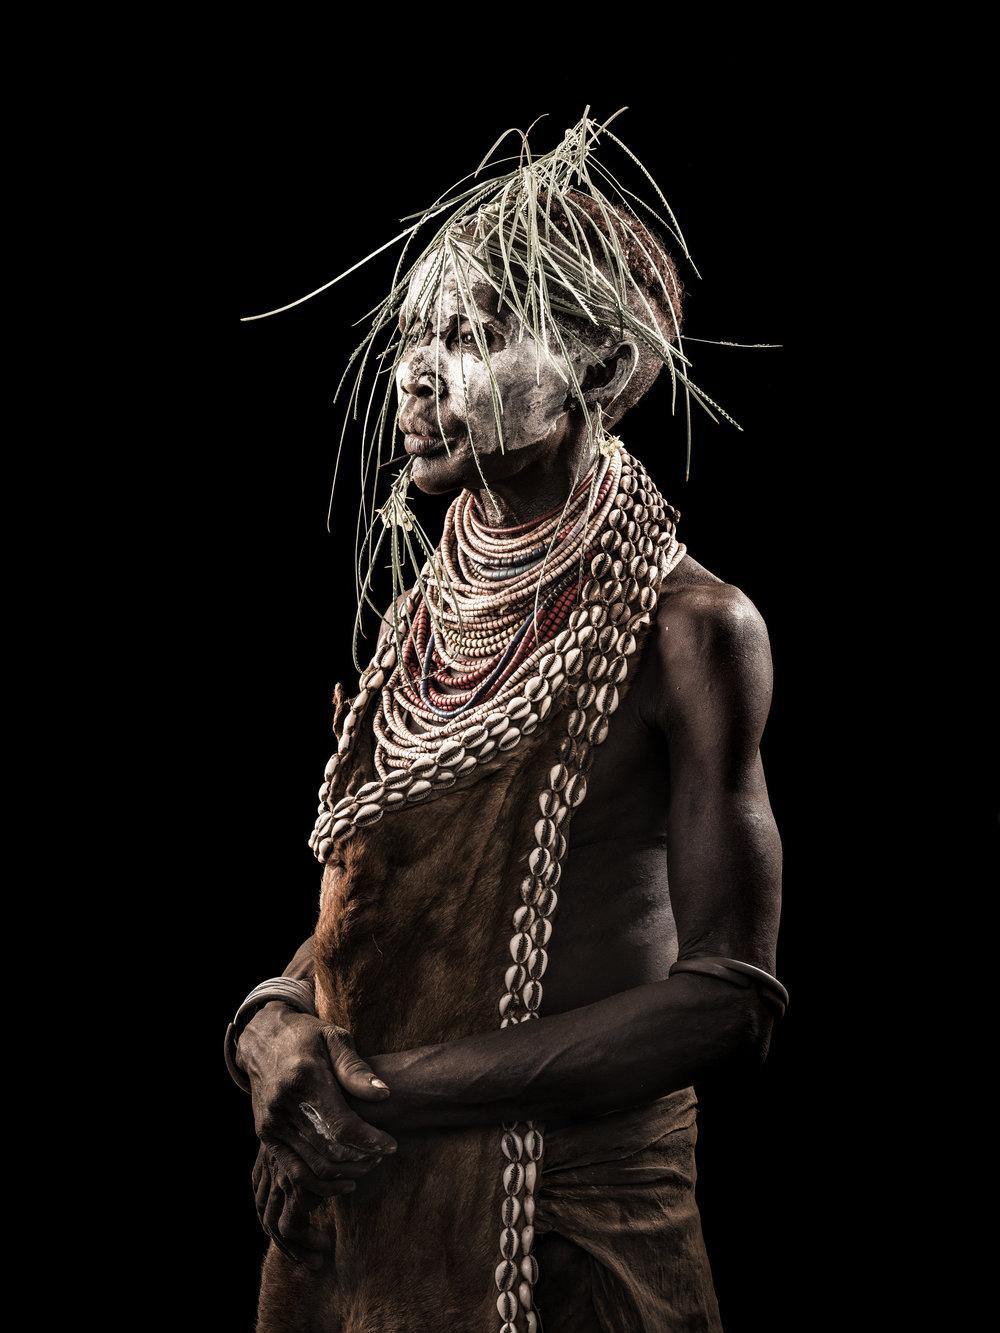 Ethiopia-Starling-PietVandenEynde_054.jpg